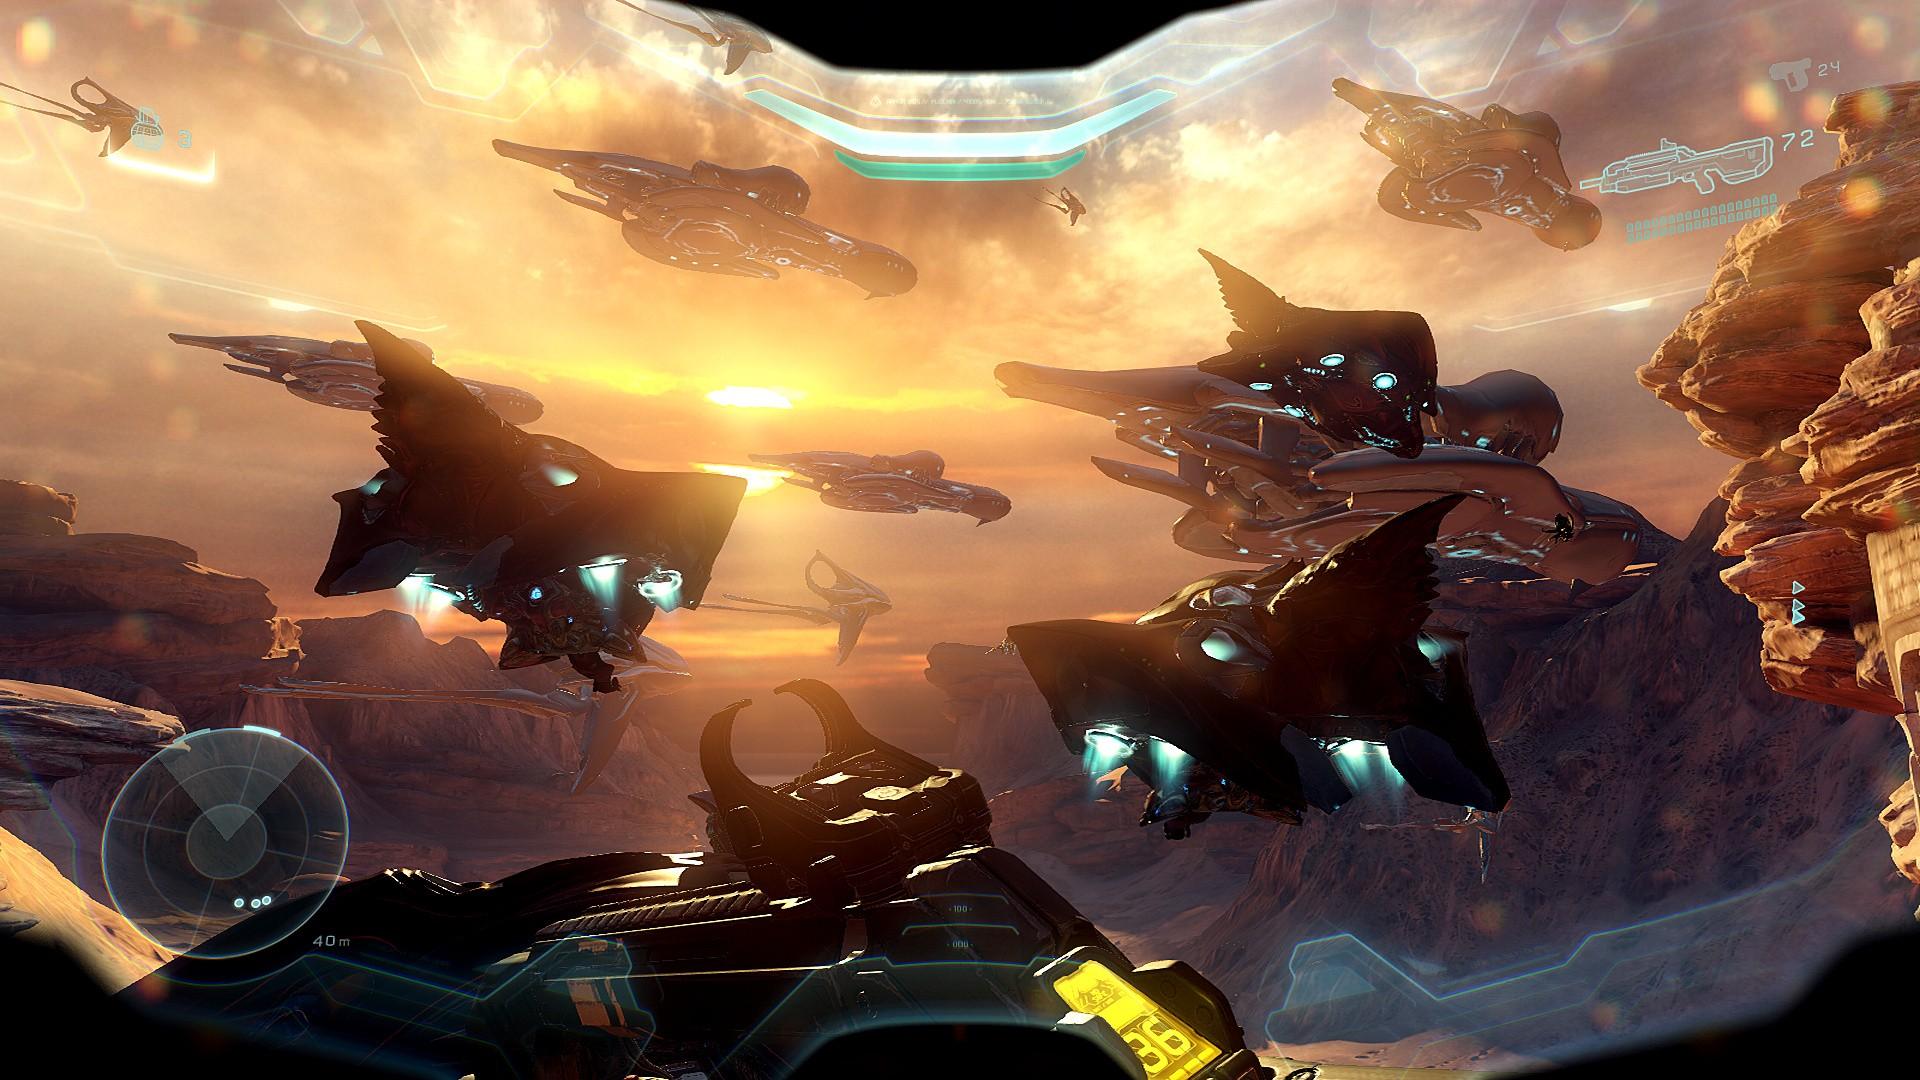 Wallpaper Spaceship Halo 5 Guardians Spartan Locke Osiris